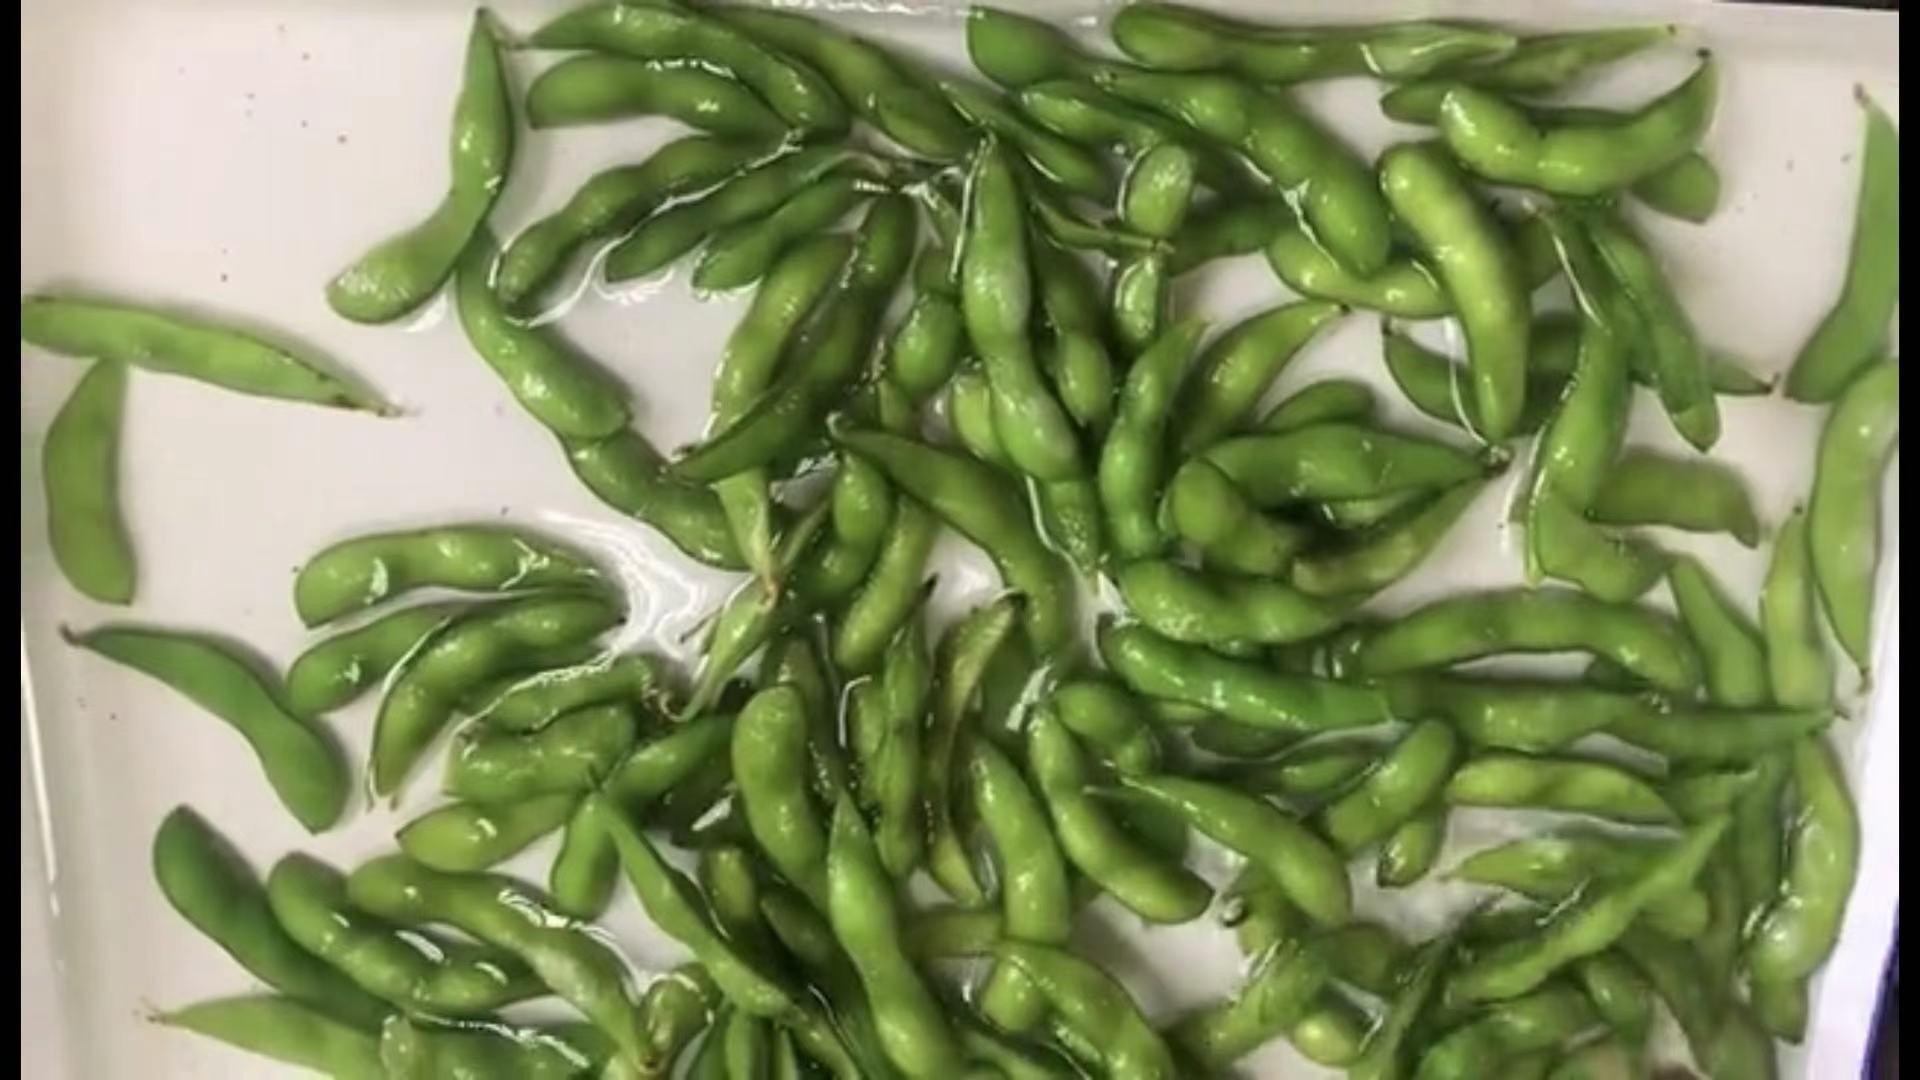 IQF Glazed Green Soybeans,IQF Glazed Edamame,IQF Glazed Soya Beans 18